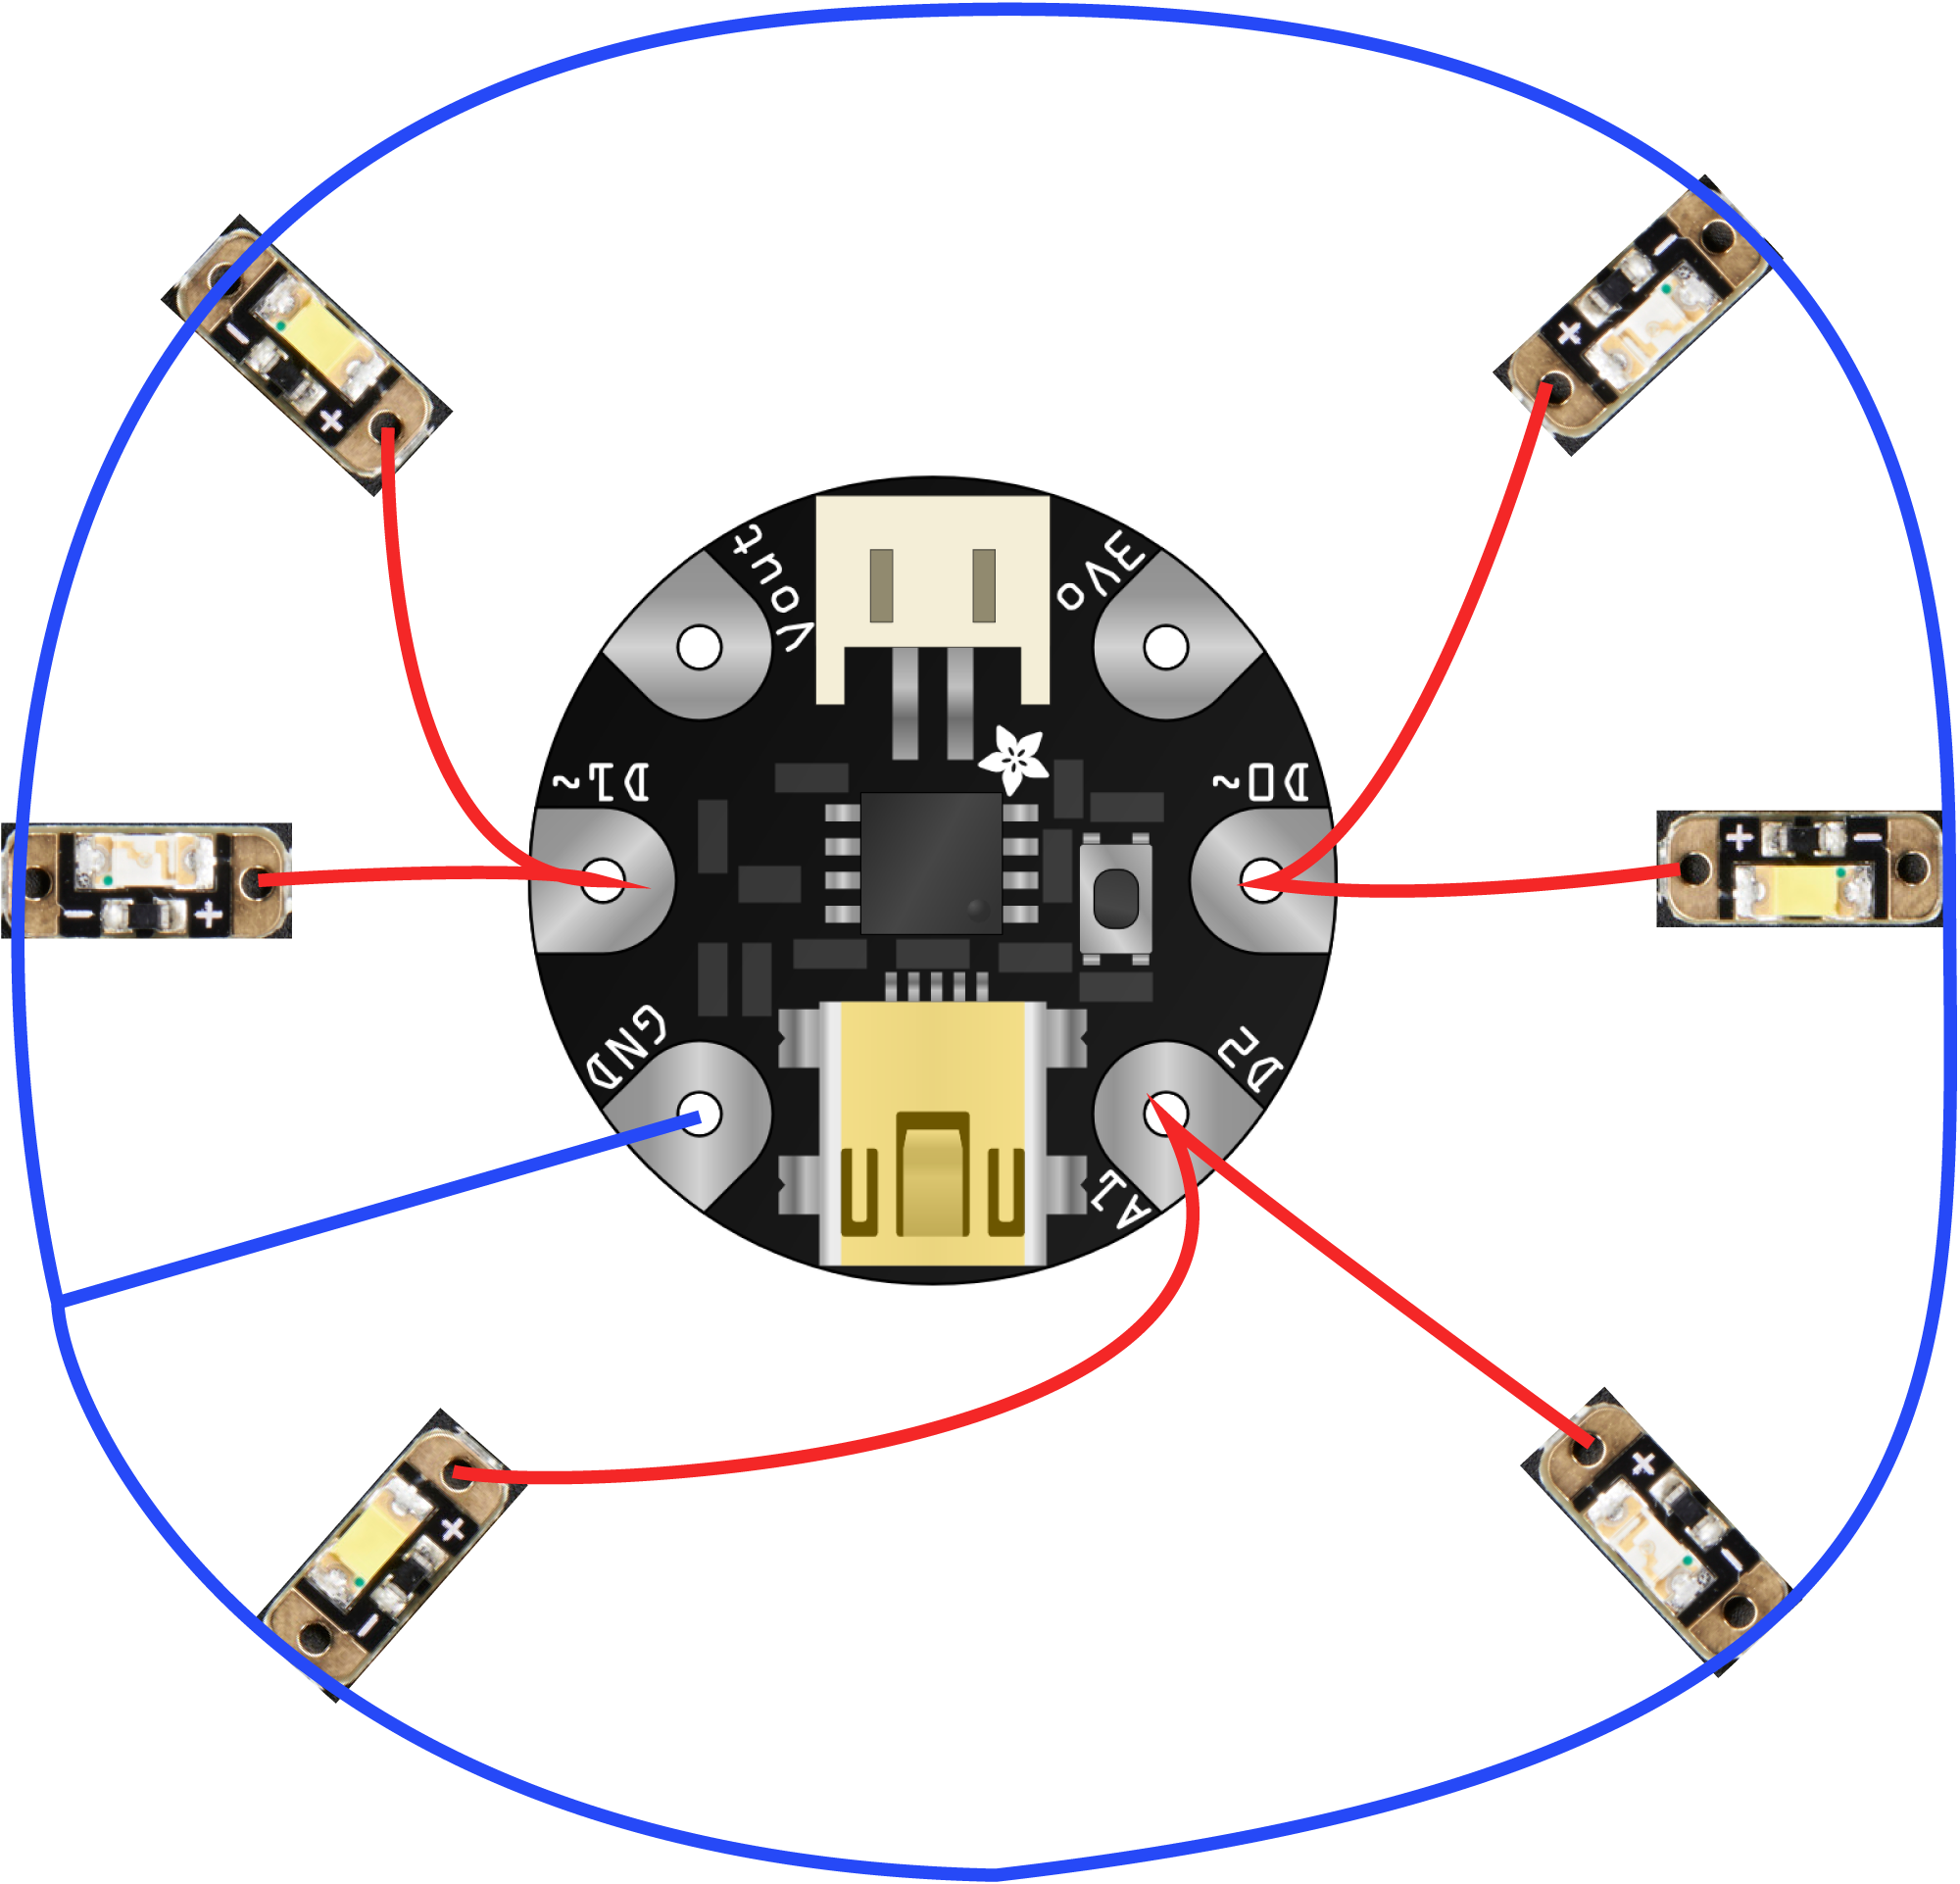 leds_sequin-diagram.png